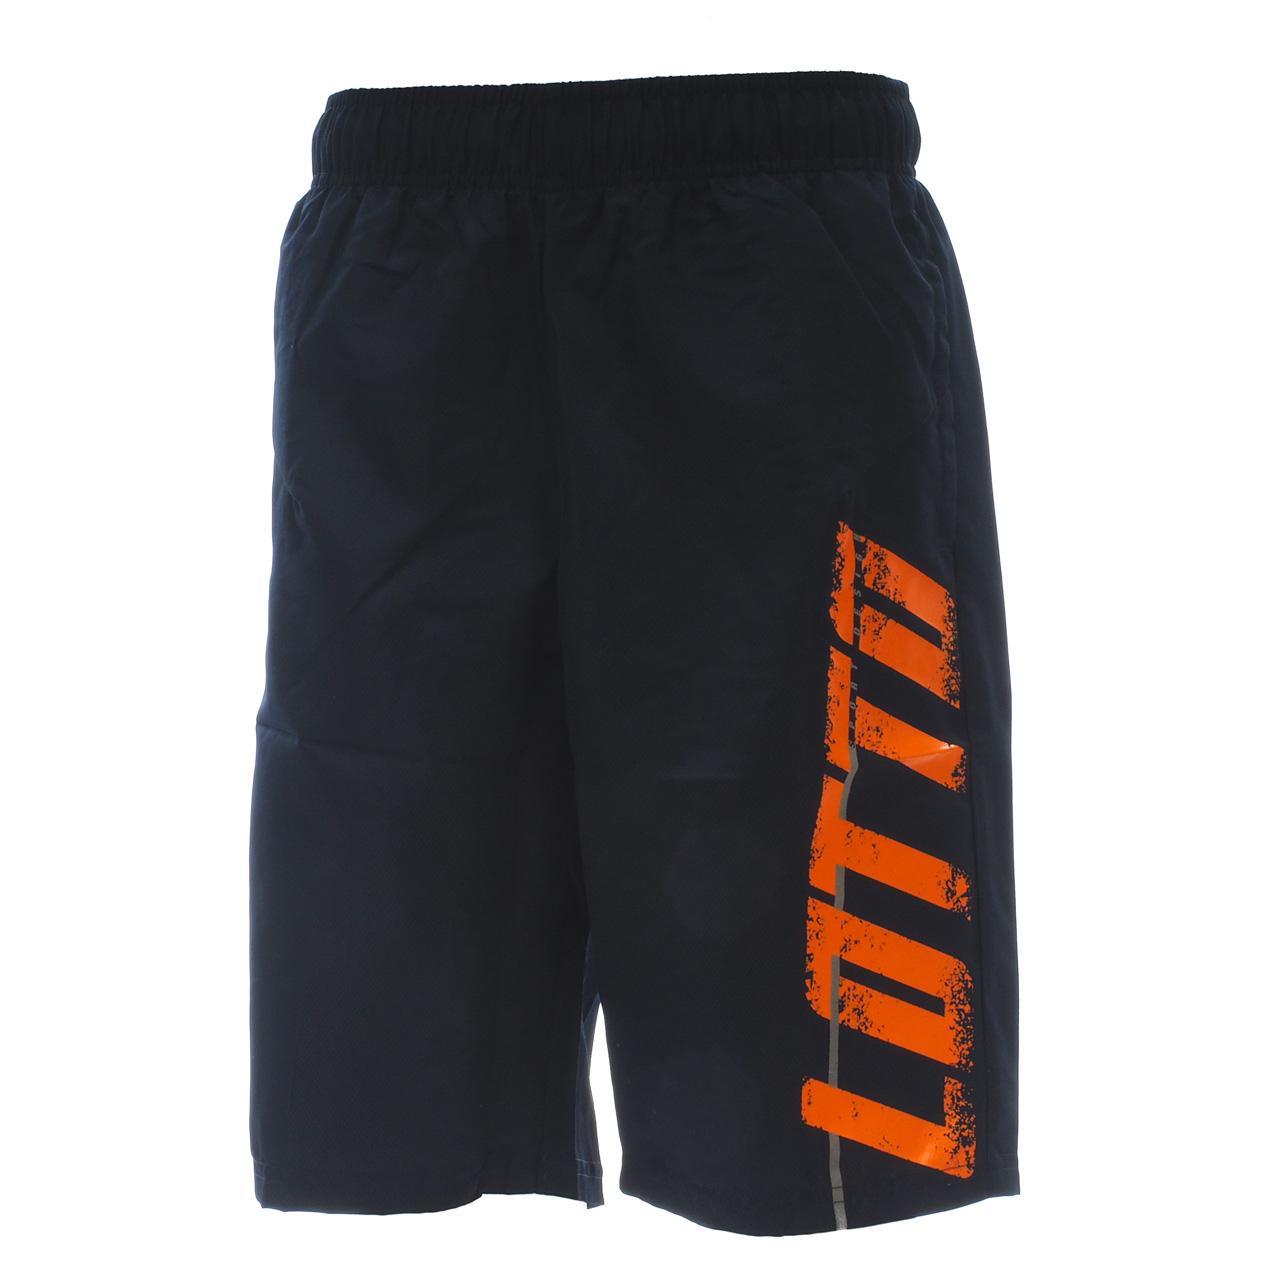 Bermuda-Shorts-Lotto-Logo-Navy-Bermuda-Blue-17798-New